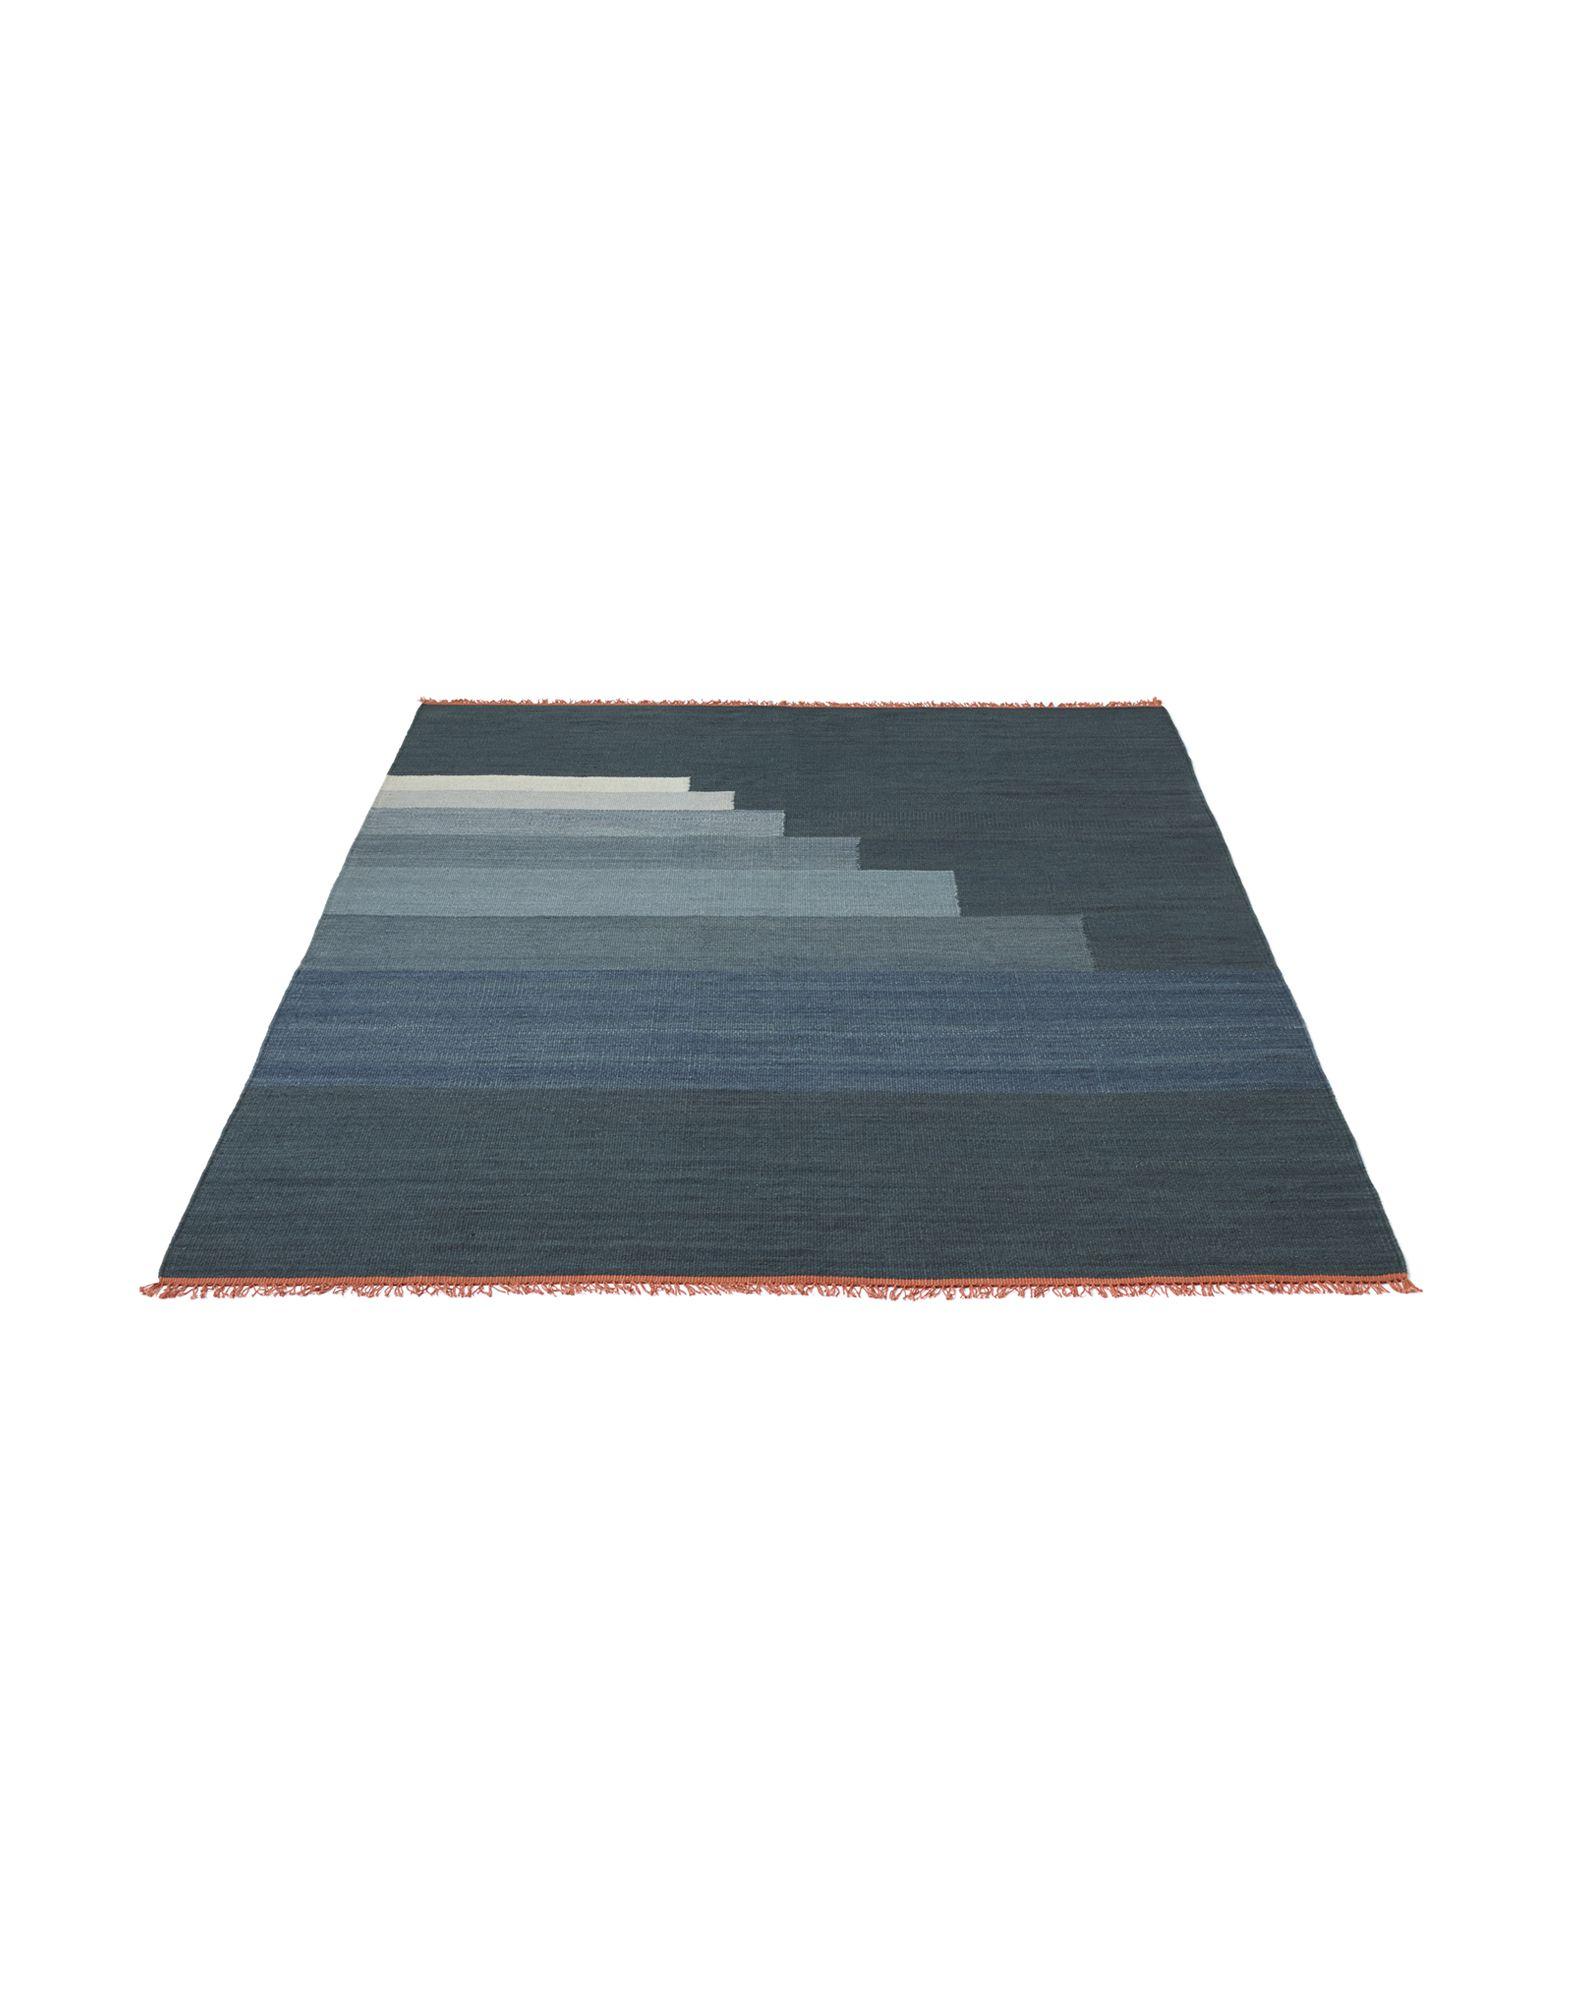 &TRADITION Unisex Teppich Farbe Taubenblau Größe 1